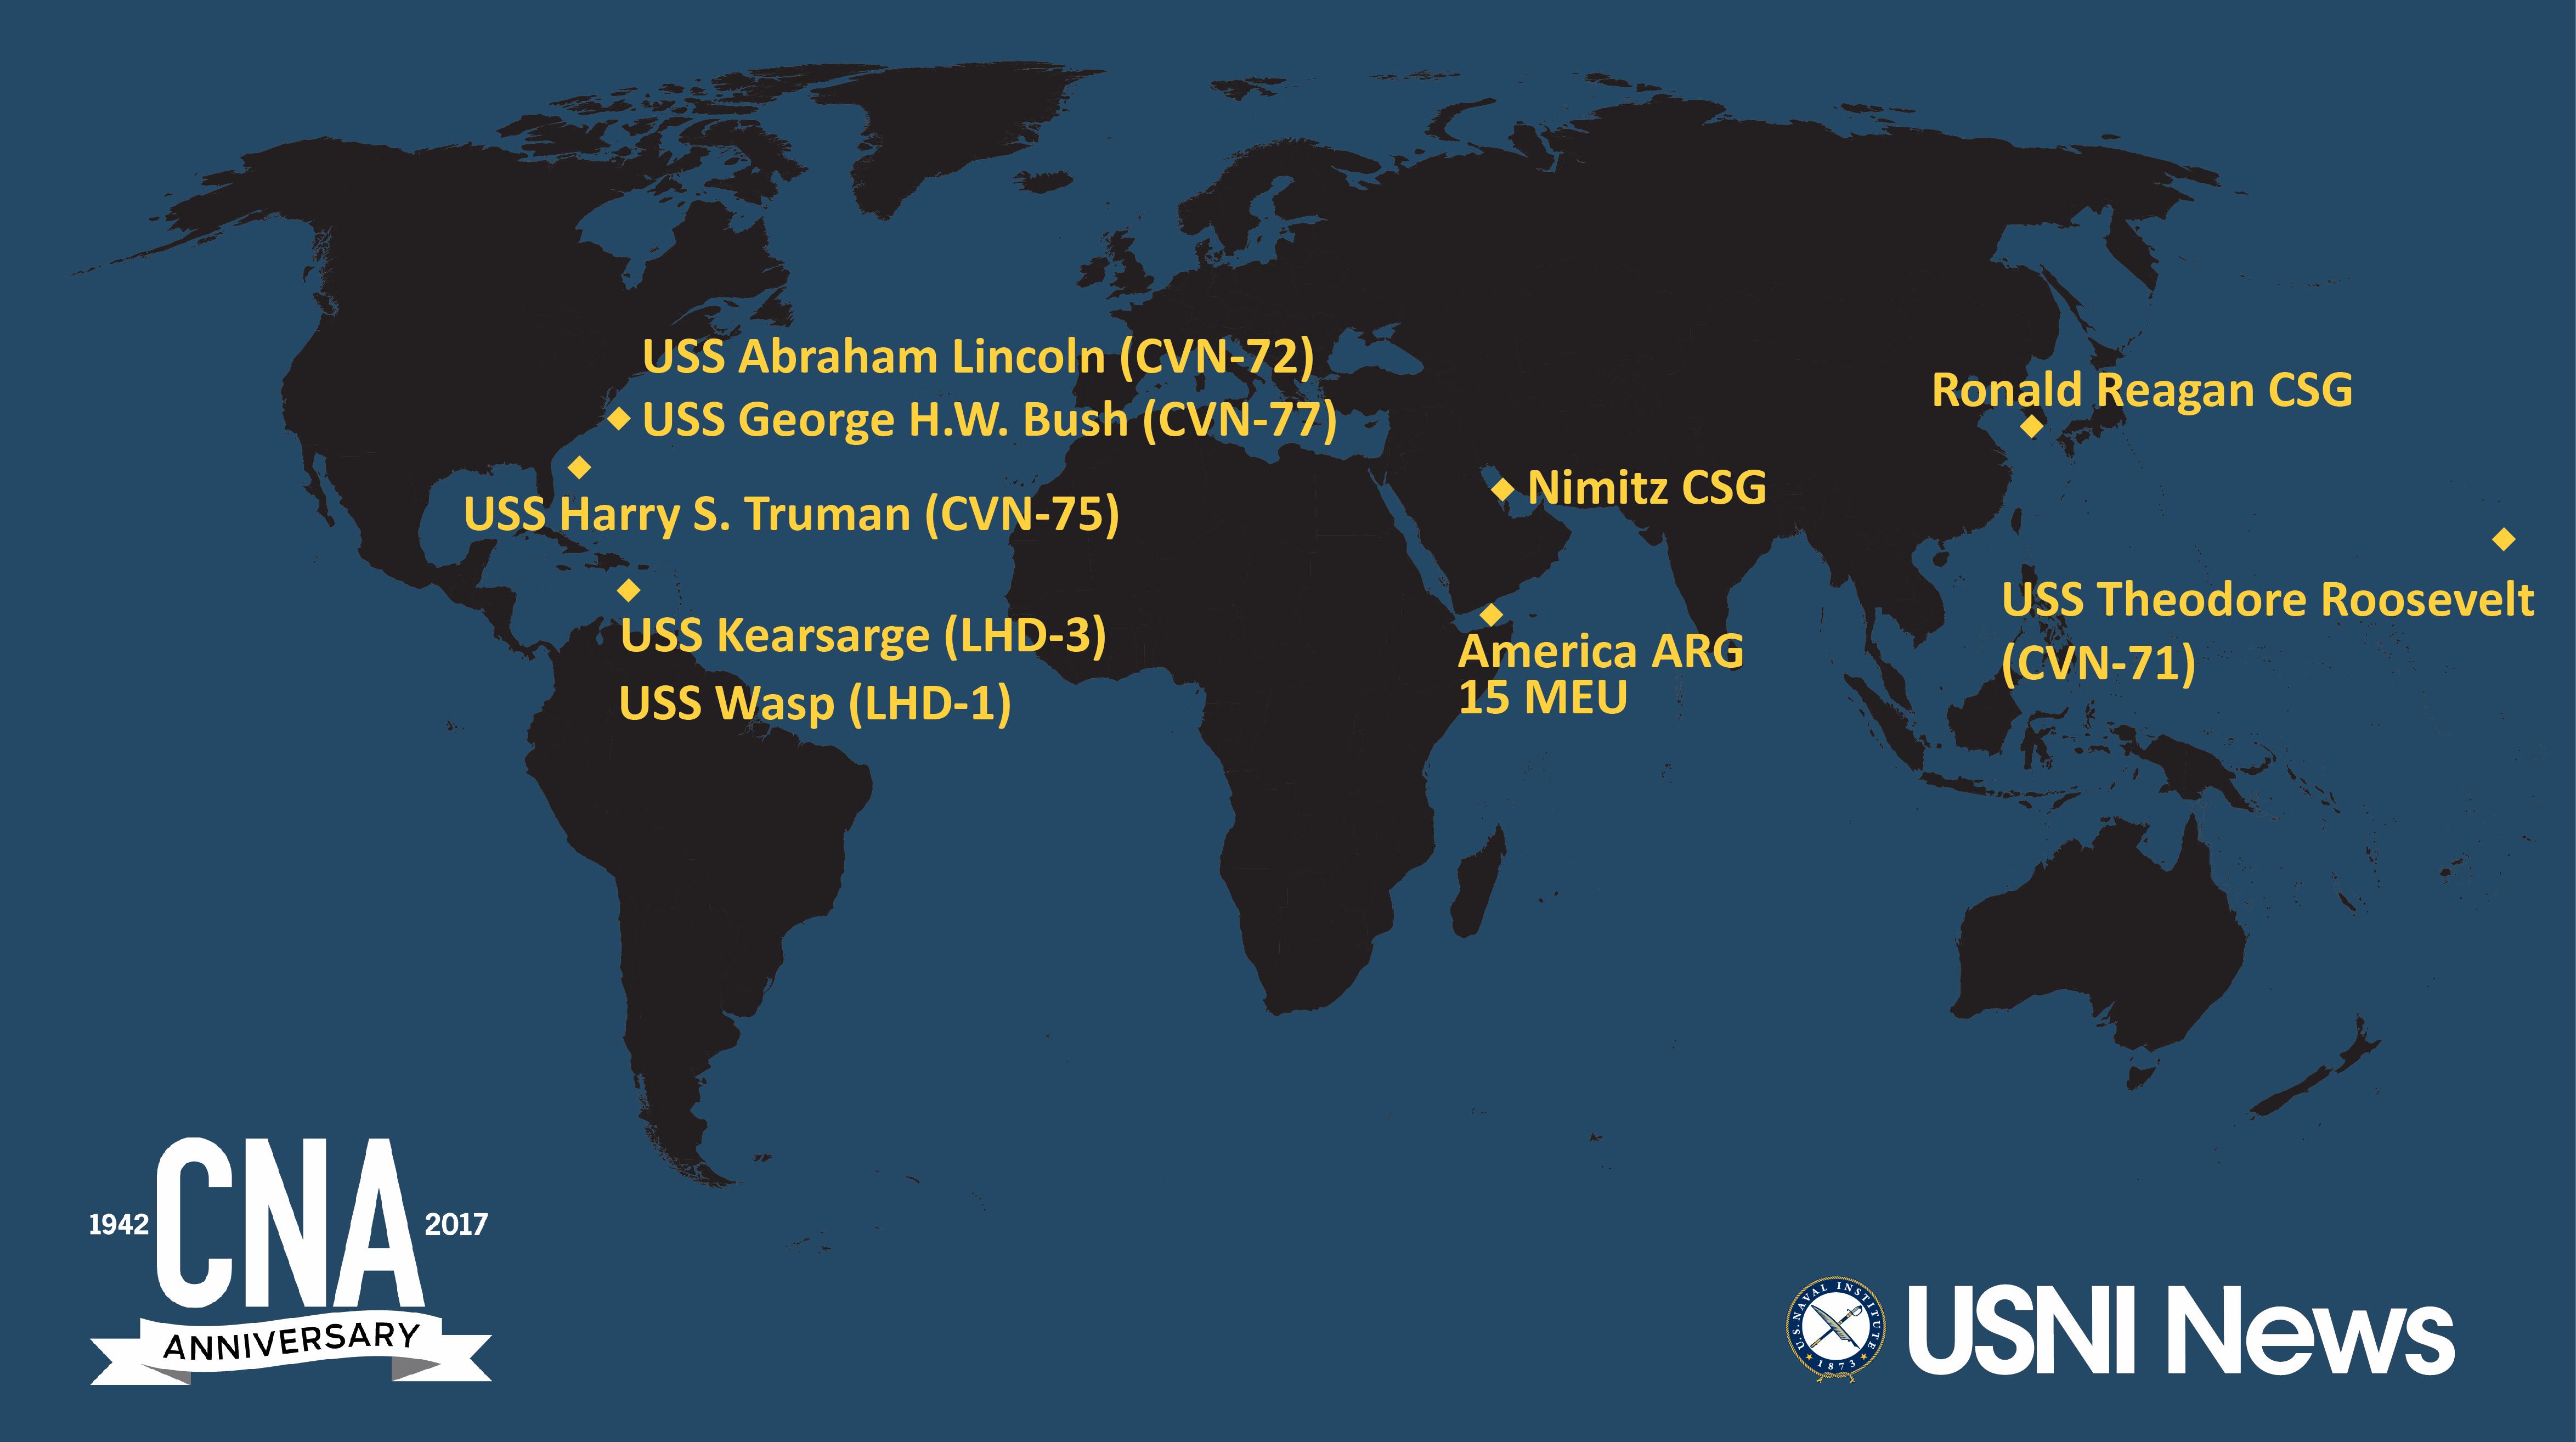 USNI NewsCNA Fleet and Marine Tracker Oct 23 2017